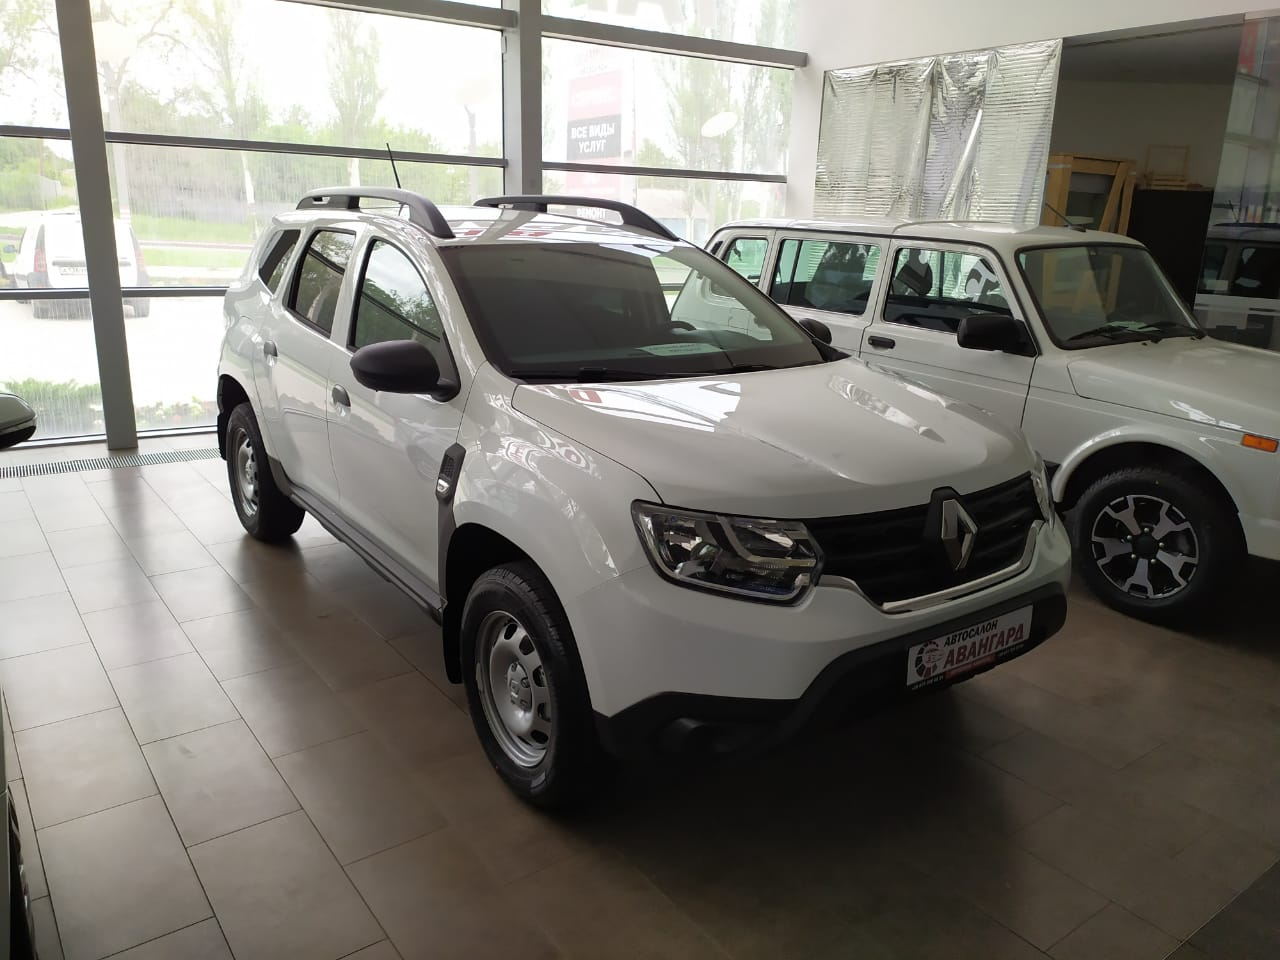 НОВЫЙ Кроссовер Renault Duster (Рено Дастер новинка) 1.6 л 16 кл. 5МТ. Life 2х4 + Пакет Зимний. Белый. 2021